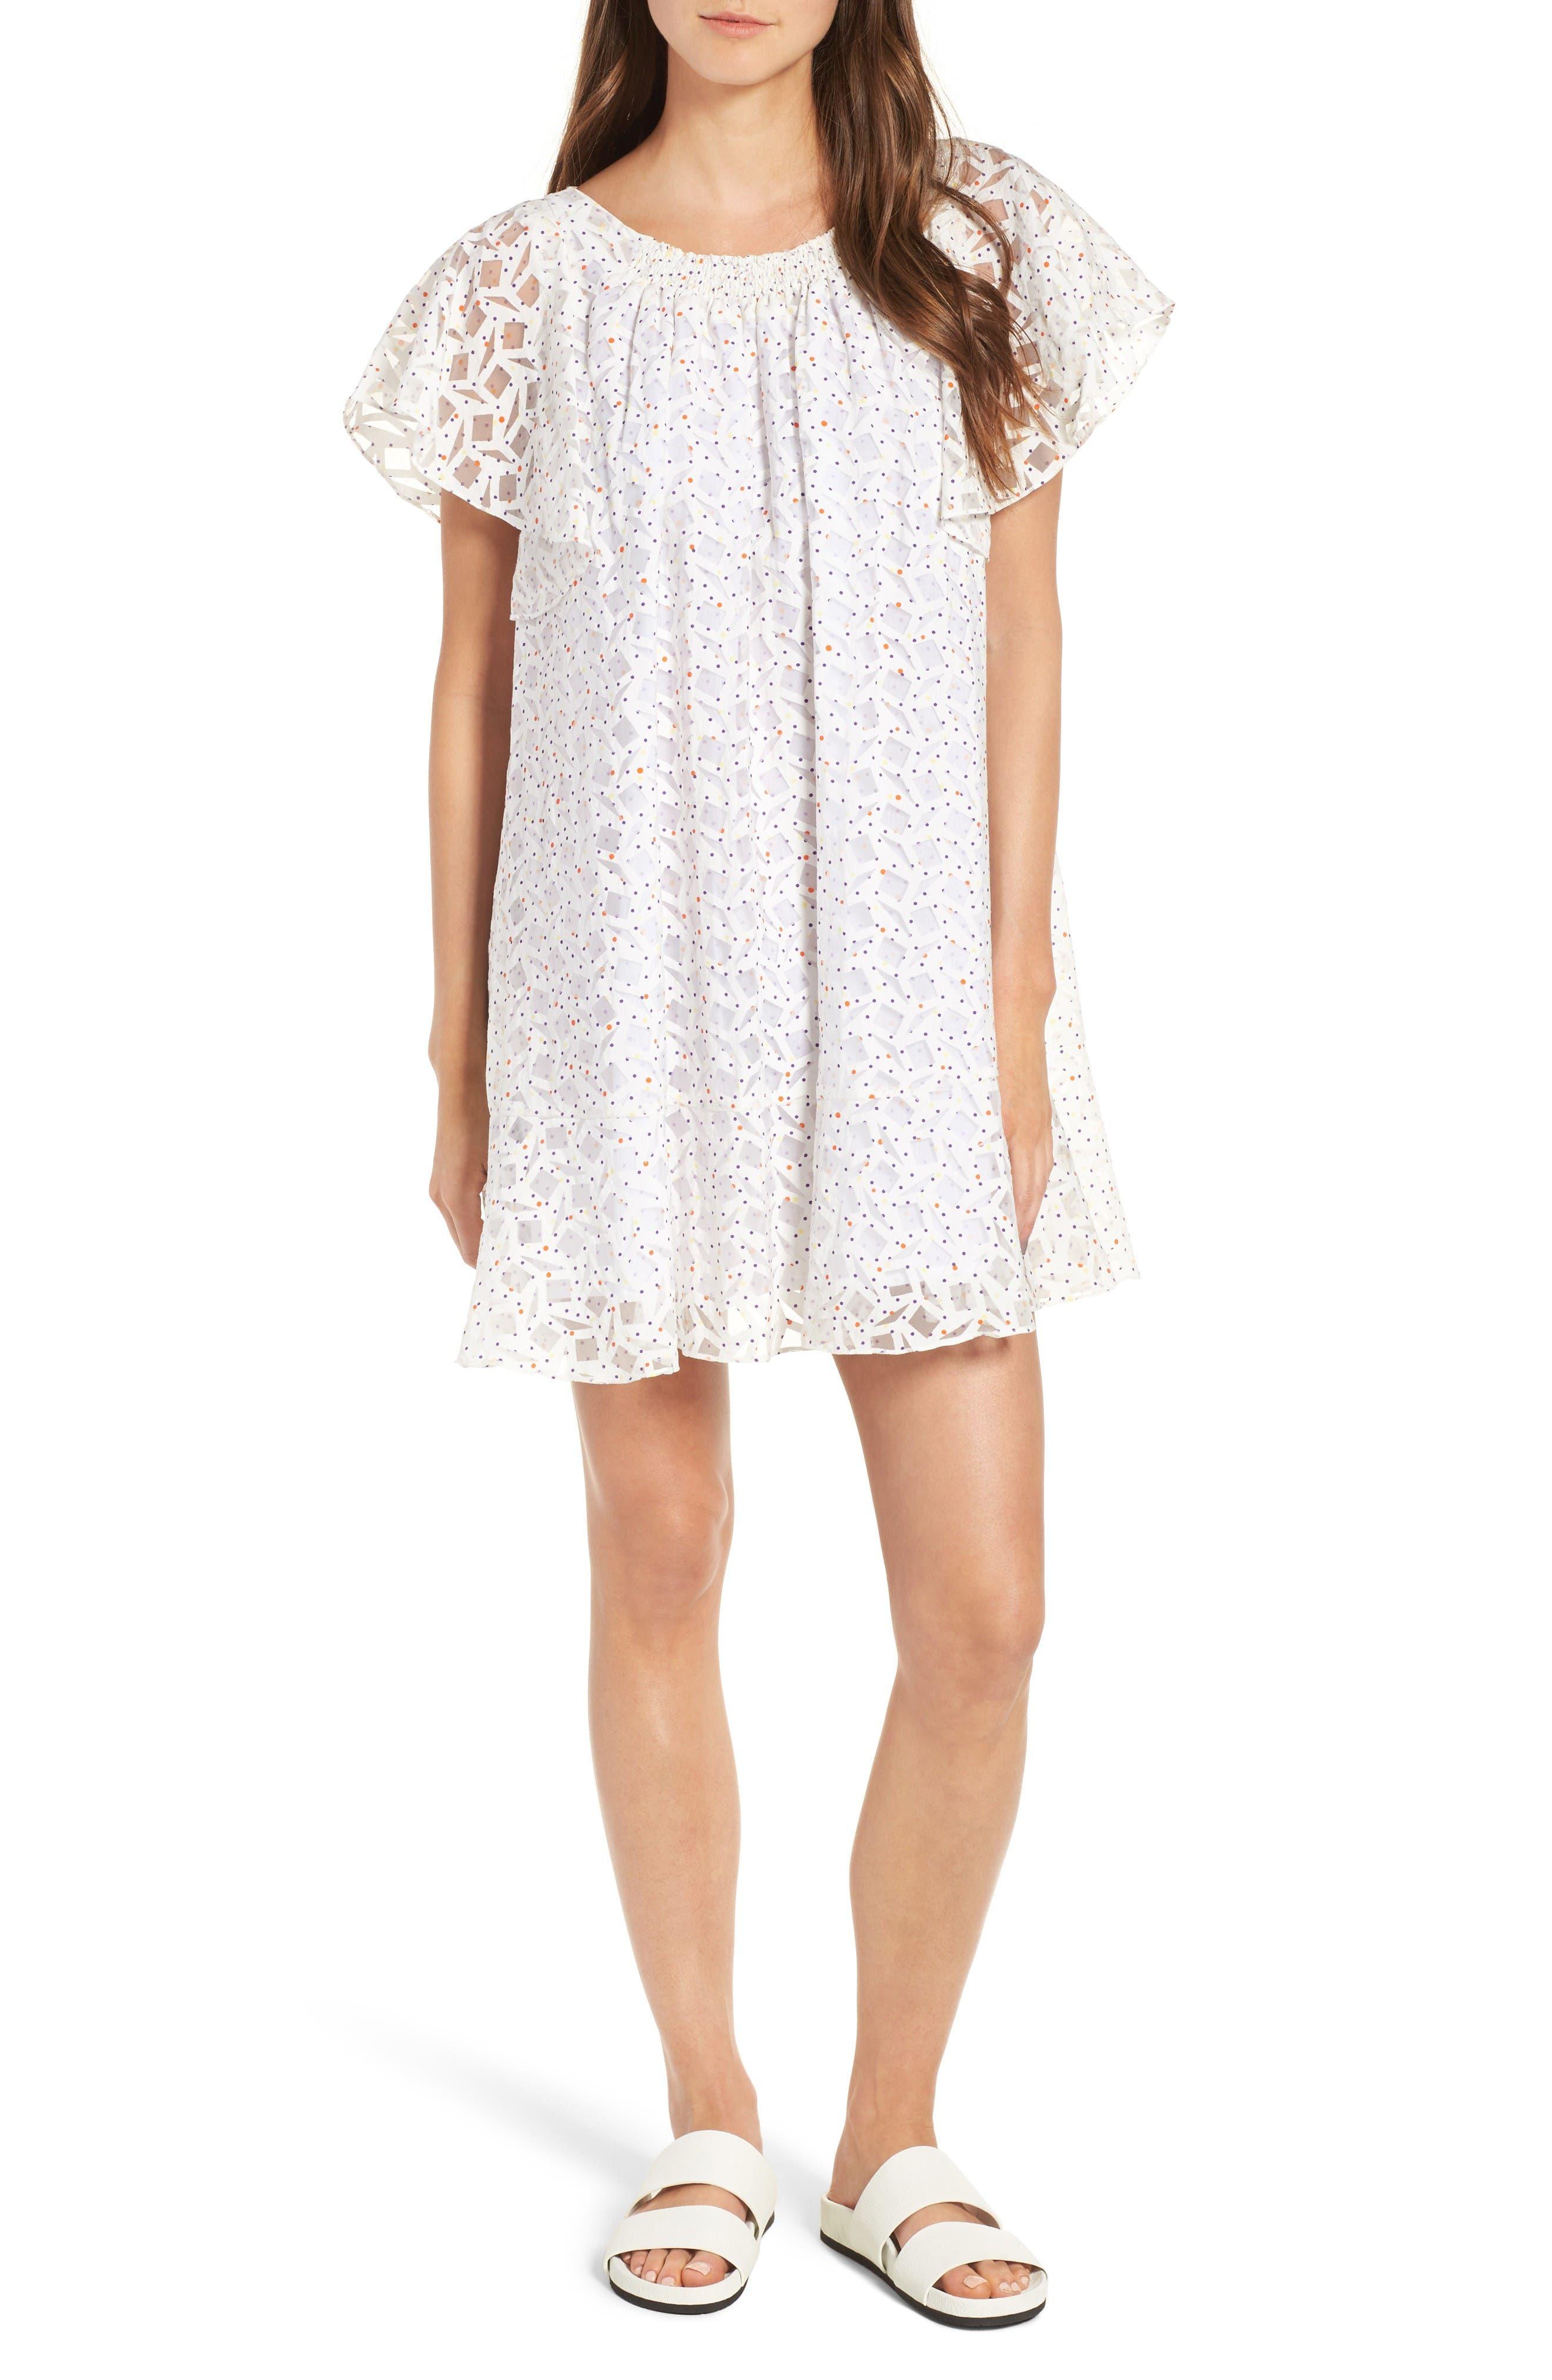 Galatee Trapeze Dress,                         Main,                         color, Blanc